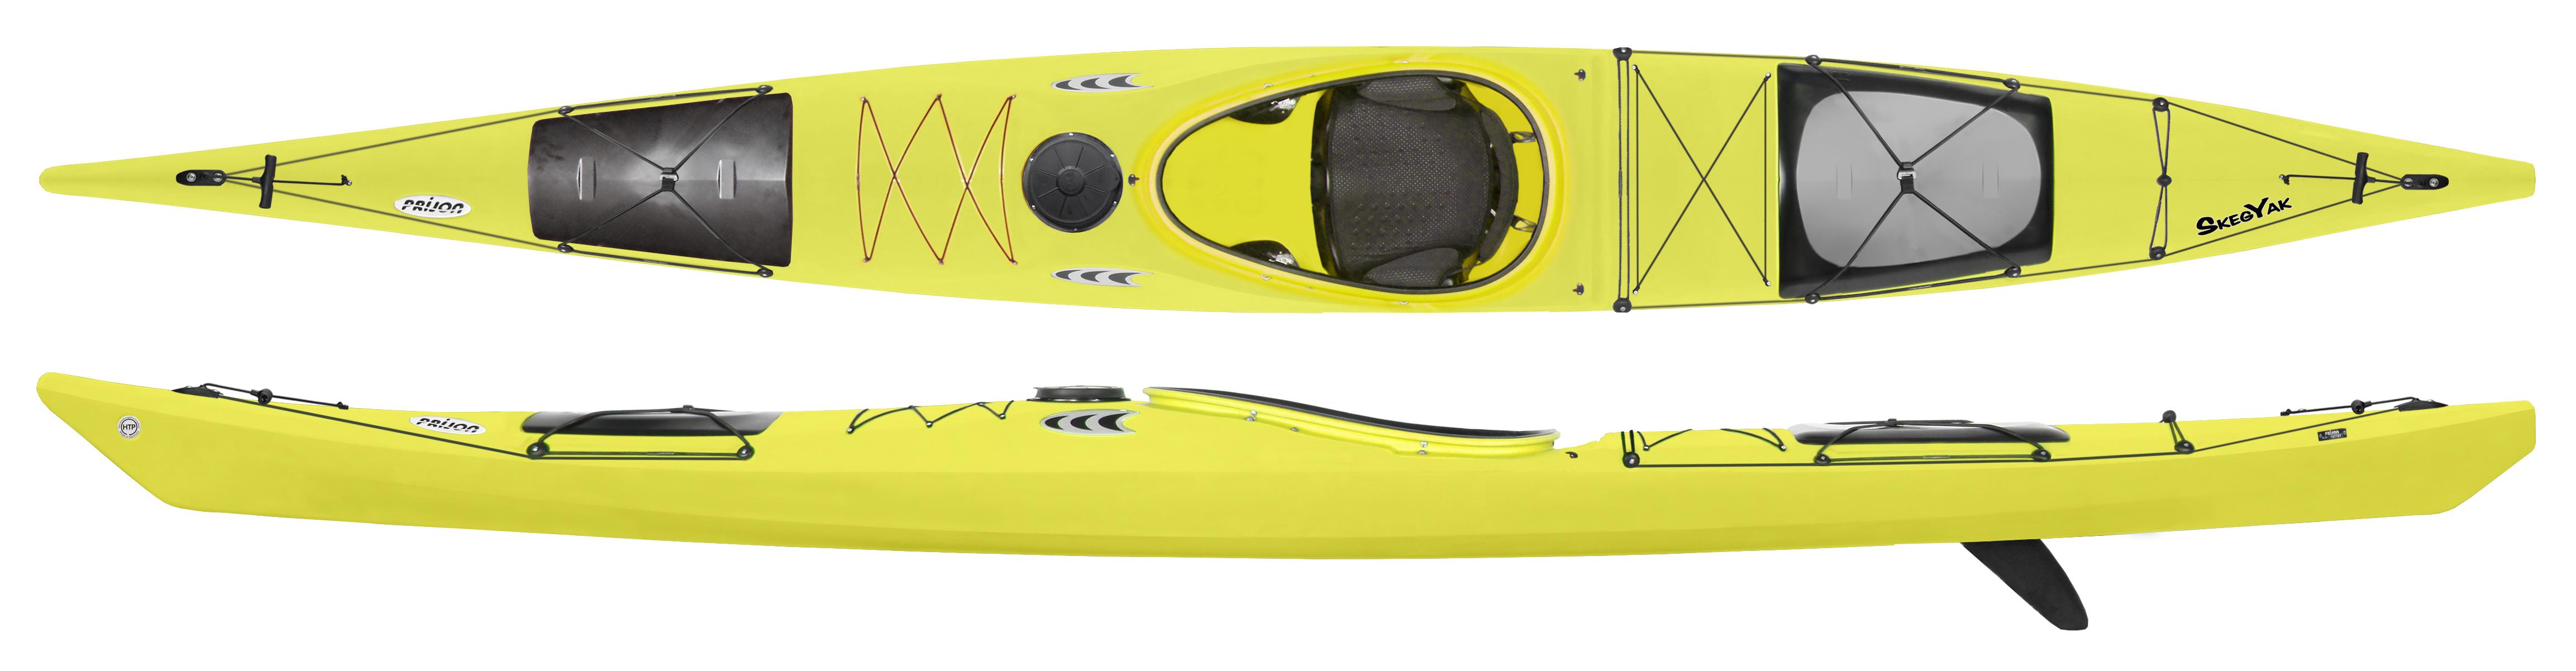 Prijon Kayaks - Eastern Outdoors